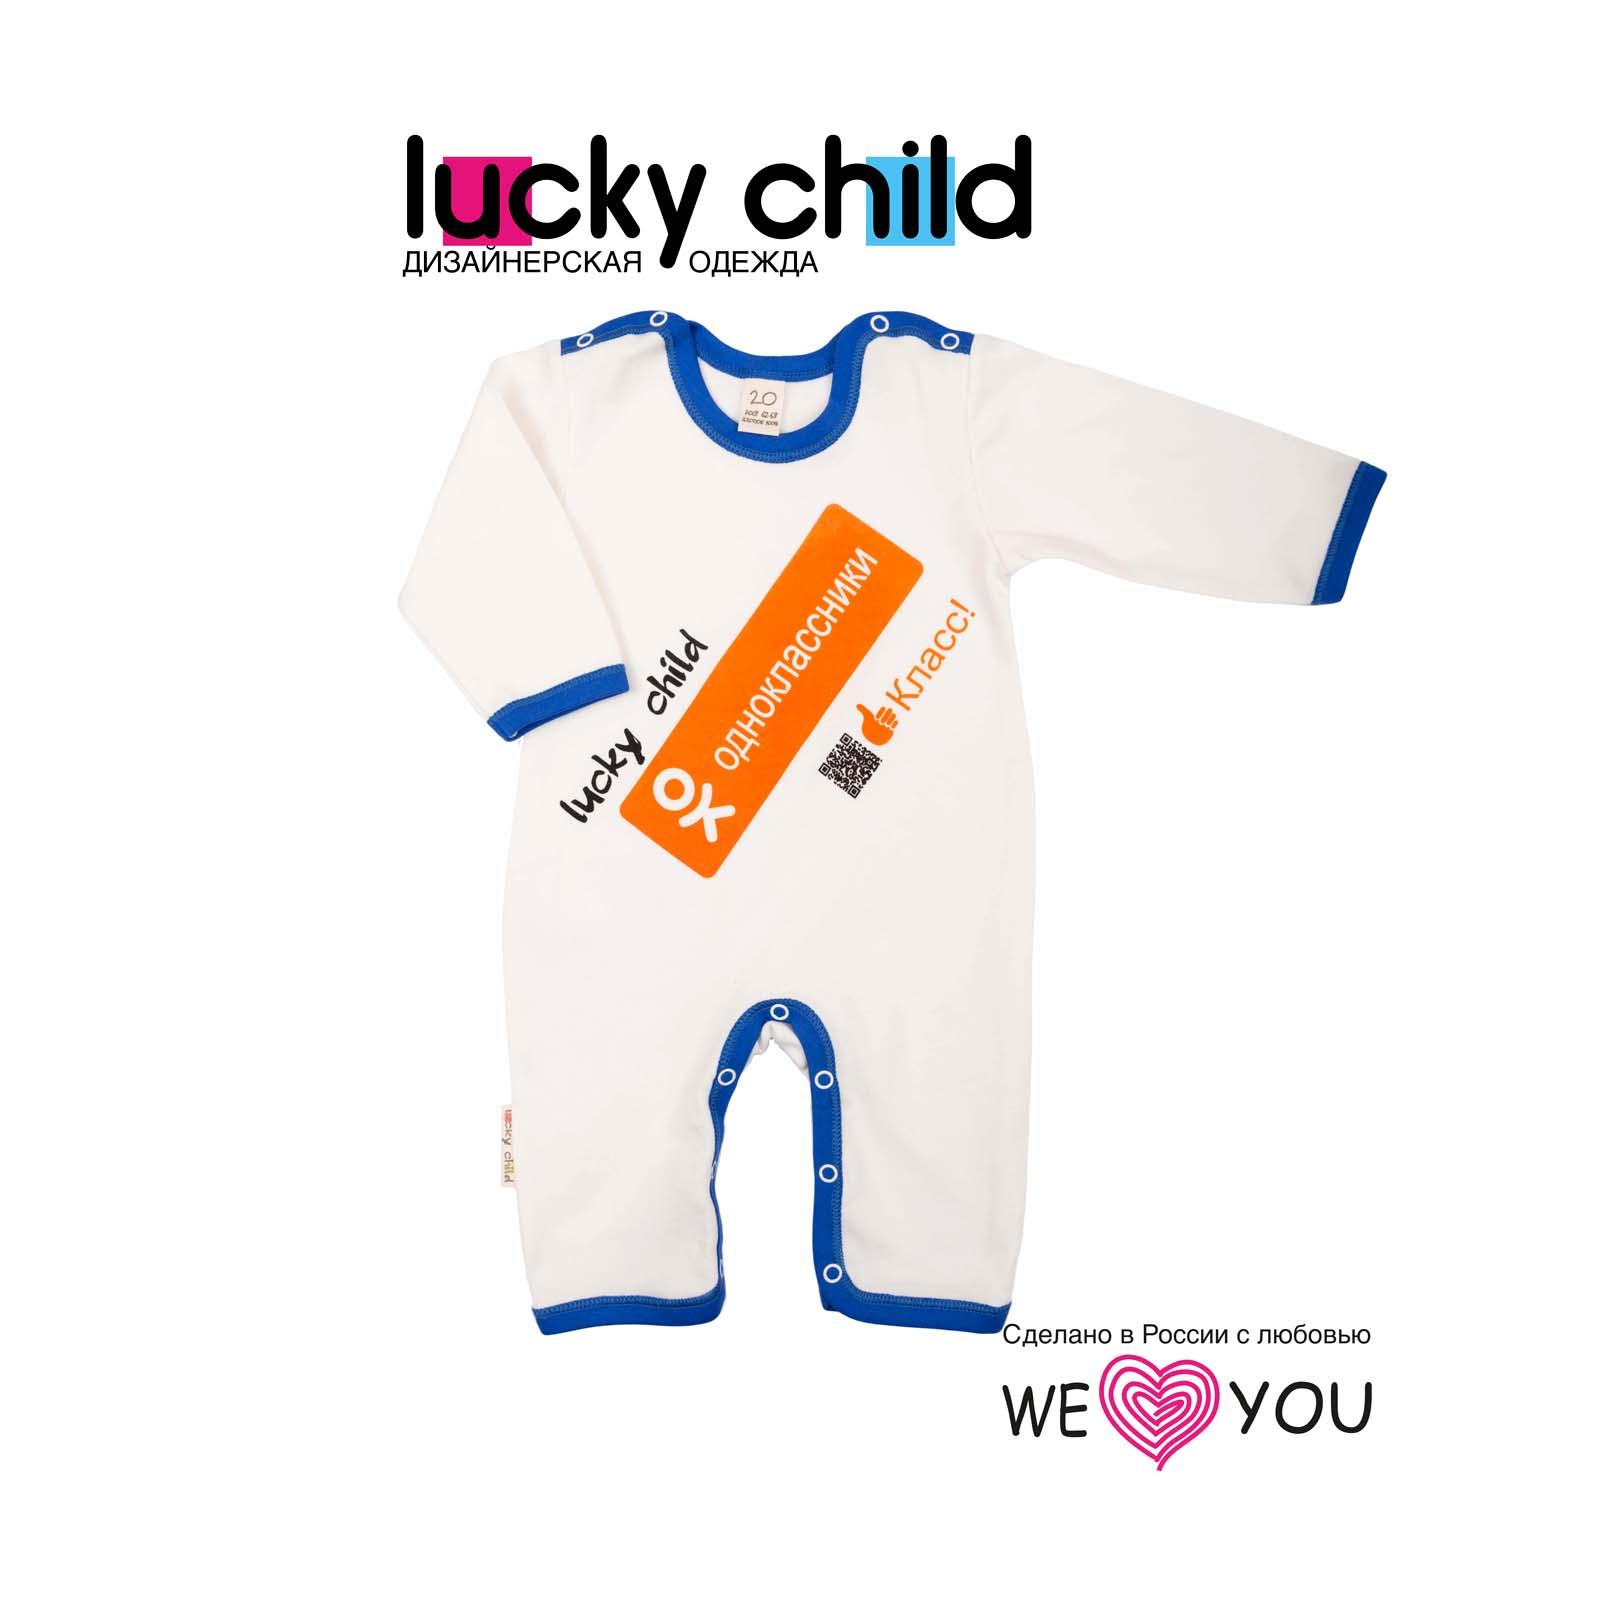 Комбинезон Lucky Child с надписью Одноклассники размер 80<br>